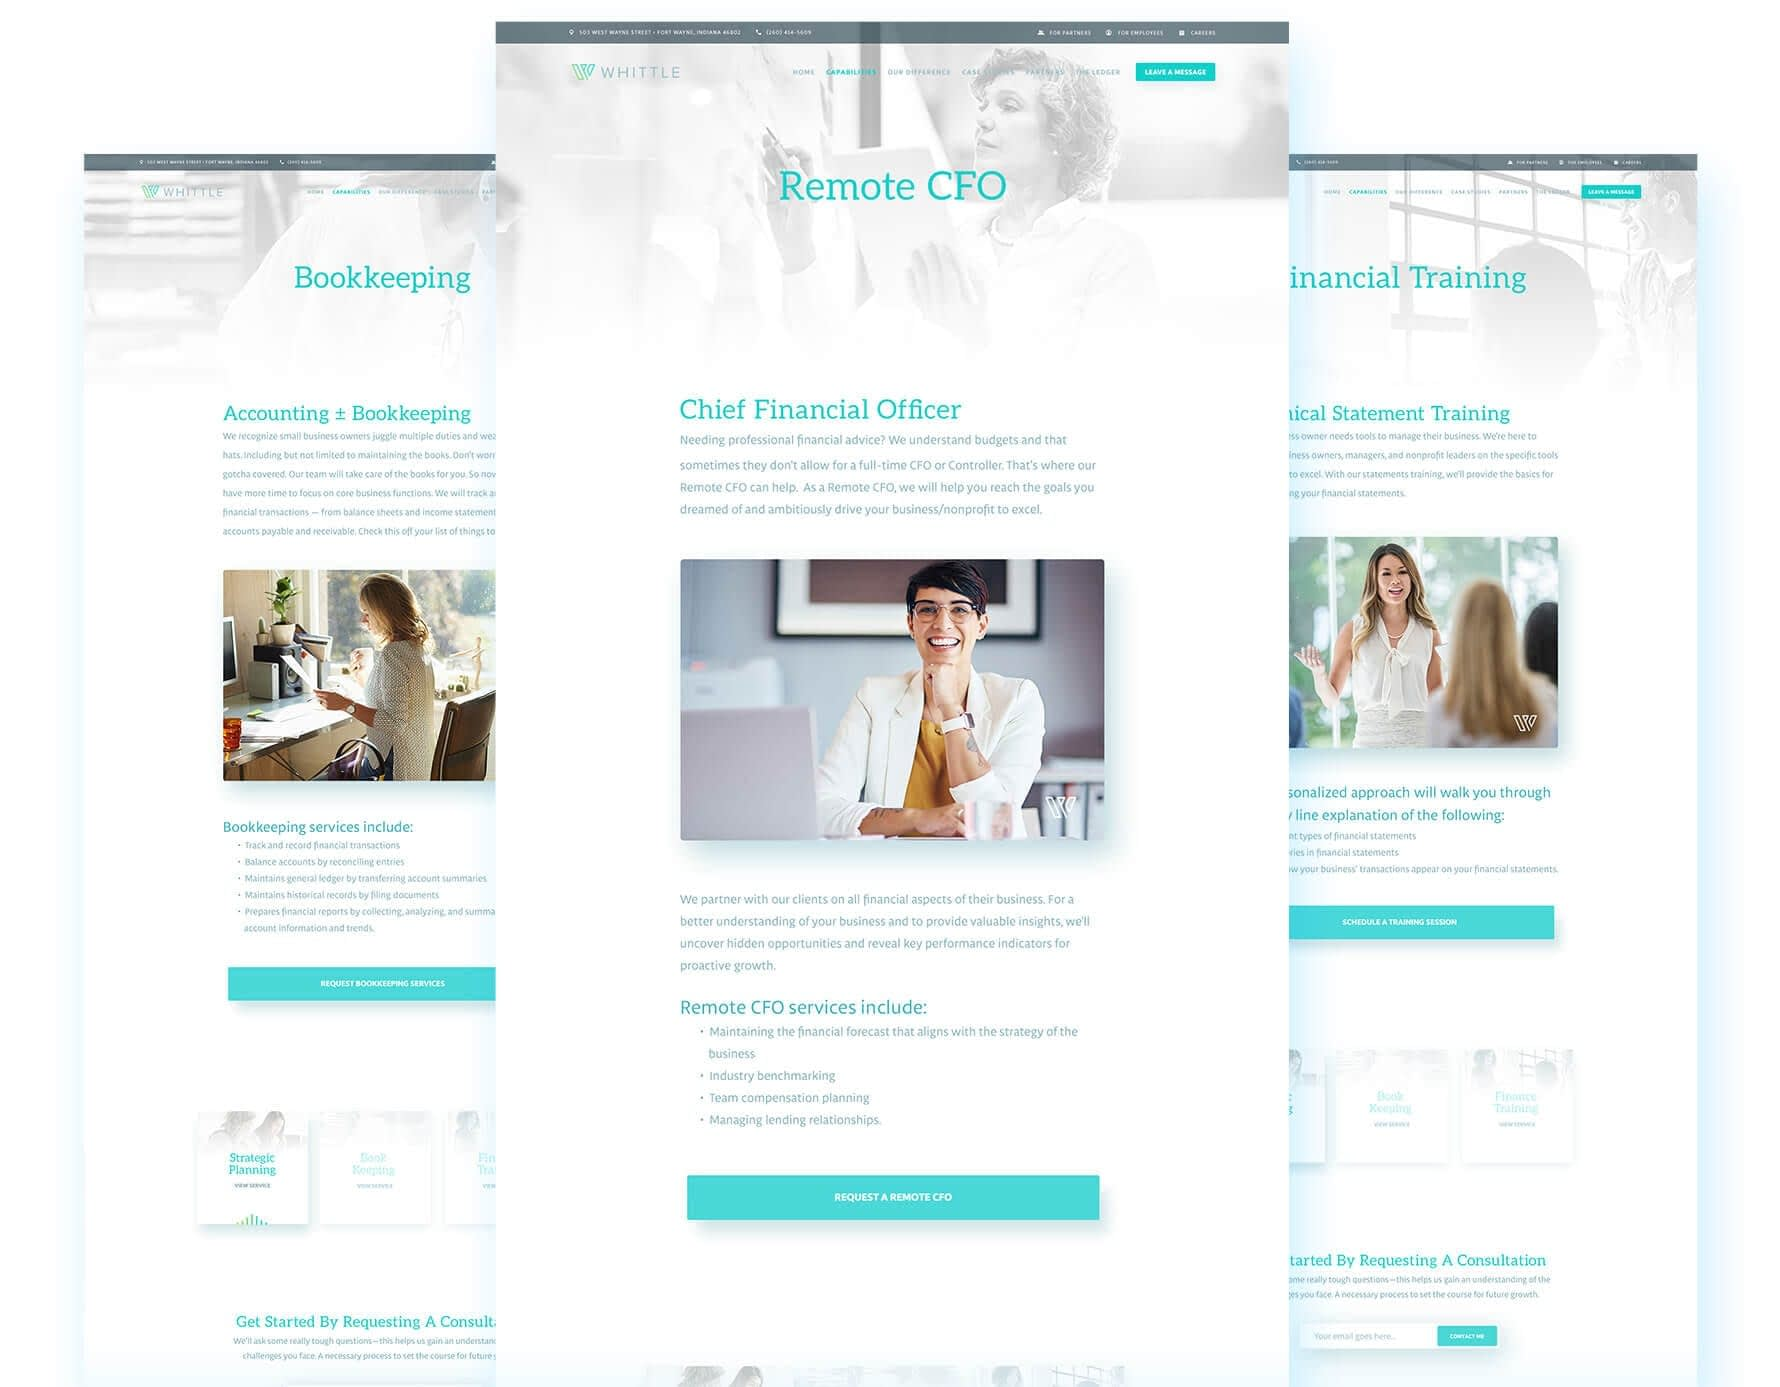 Whittle-Strategies_Proactive-Accounting_WhittleStrategies-com_Responsive-Web-Design_RWD-Wordpress_Wireframes_Wireframing